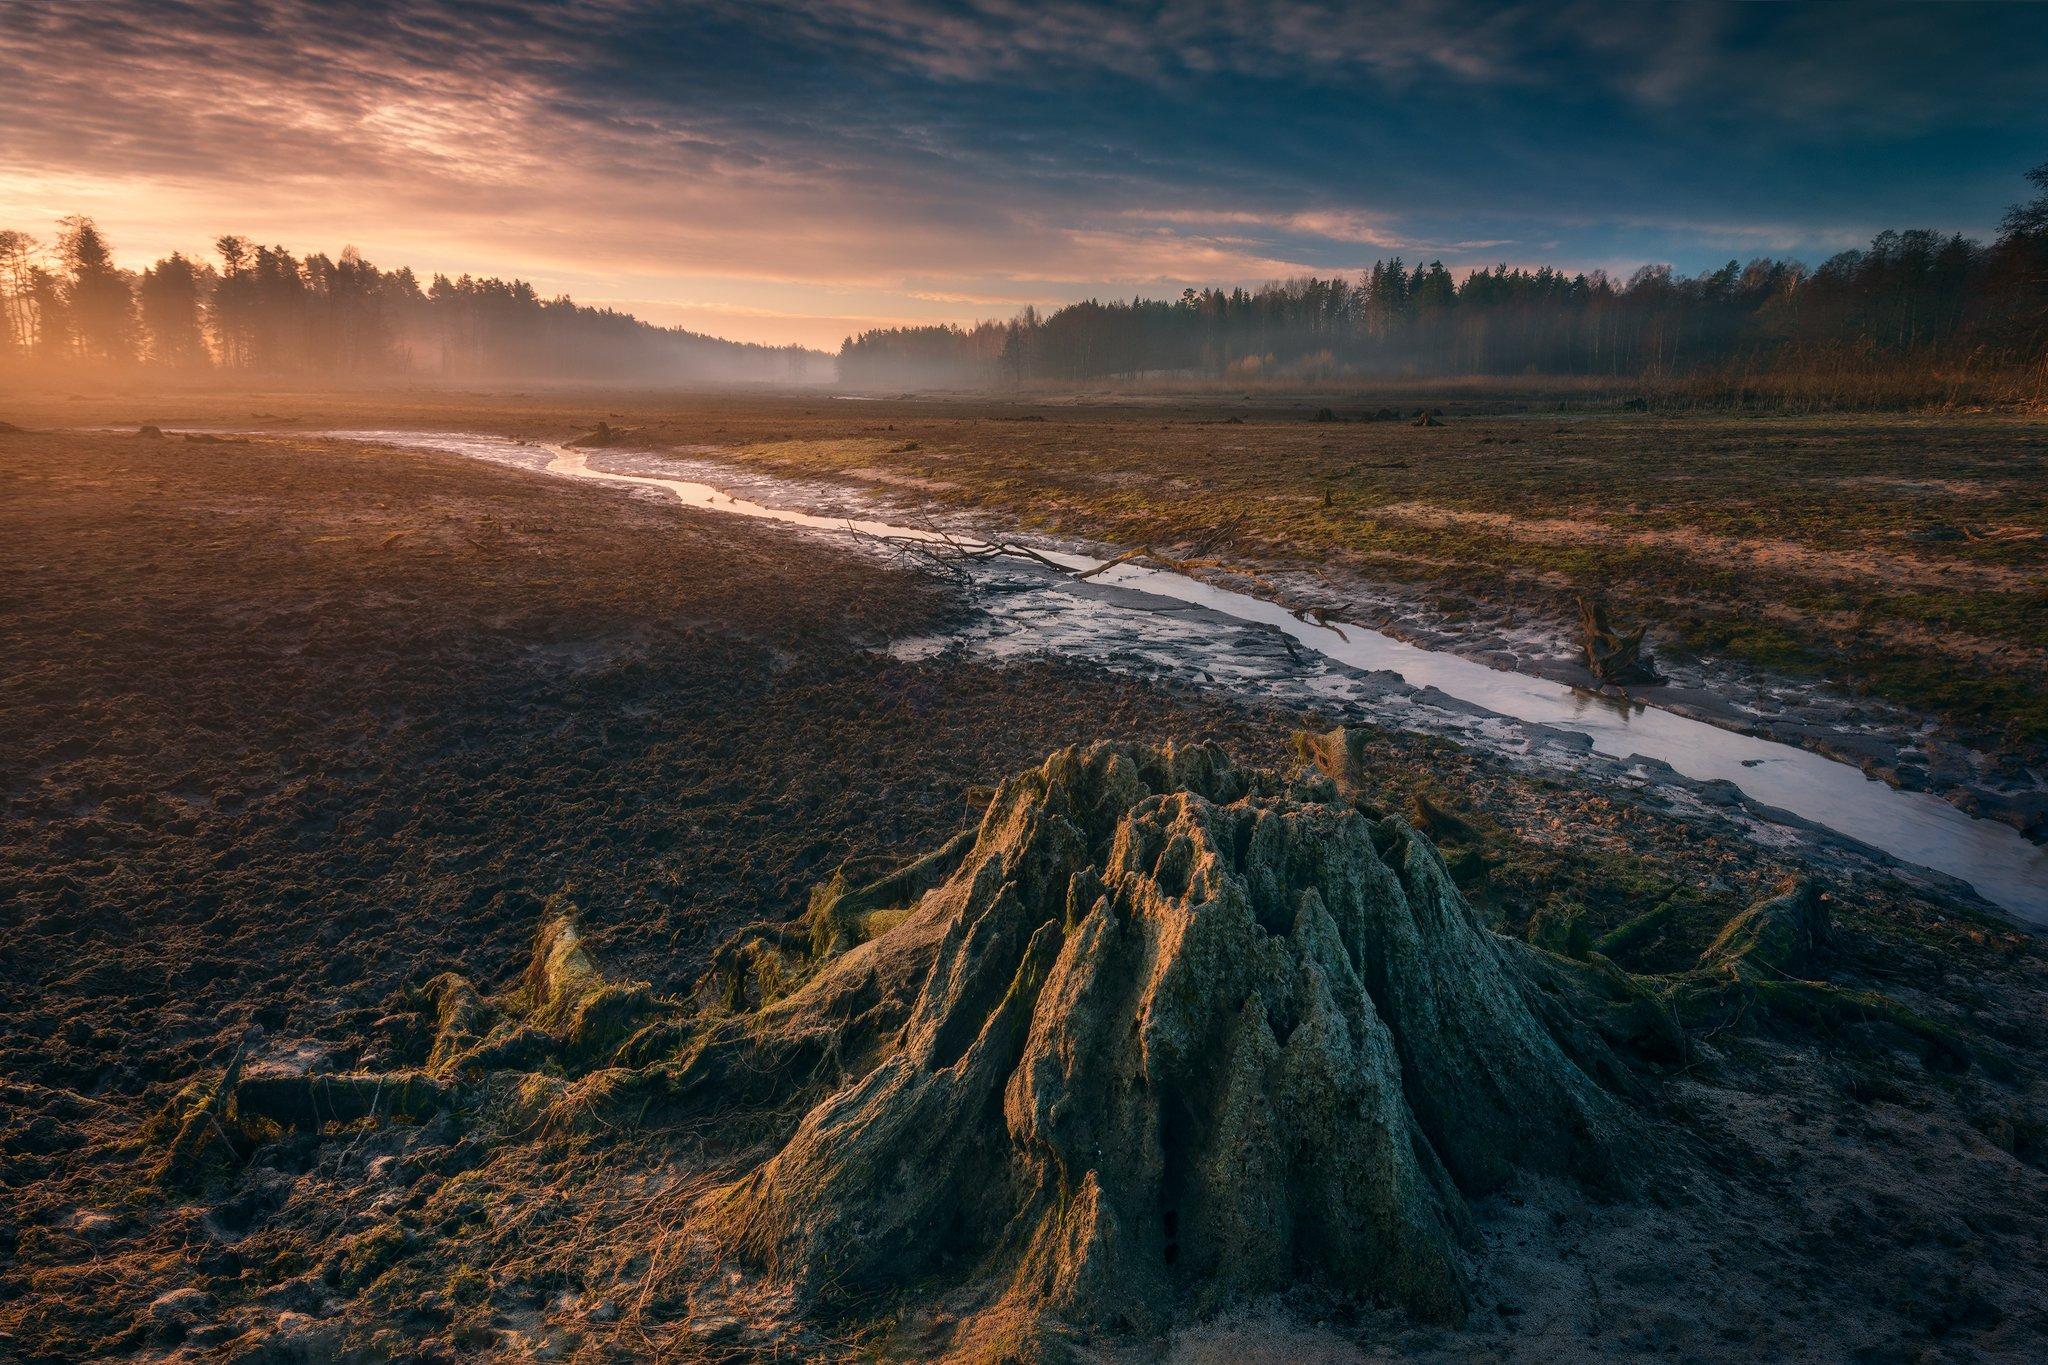 lake poland podlasie dawn sunrise sky clouds water colors mood komosa trunk, Maciej Warchoł